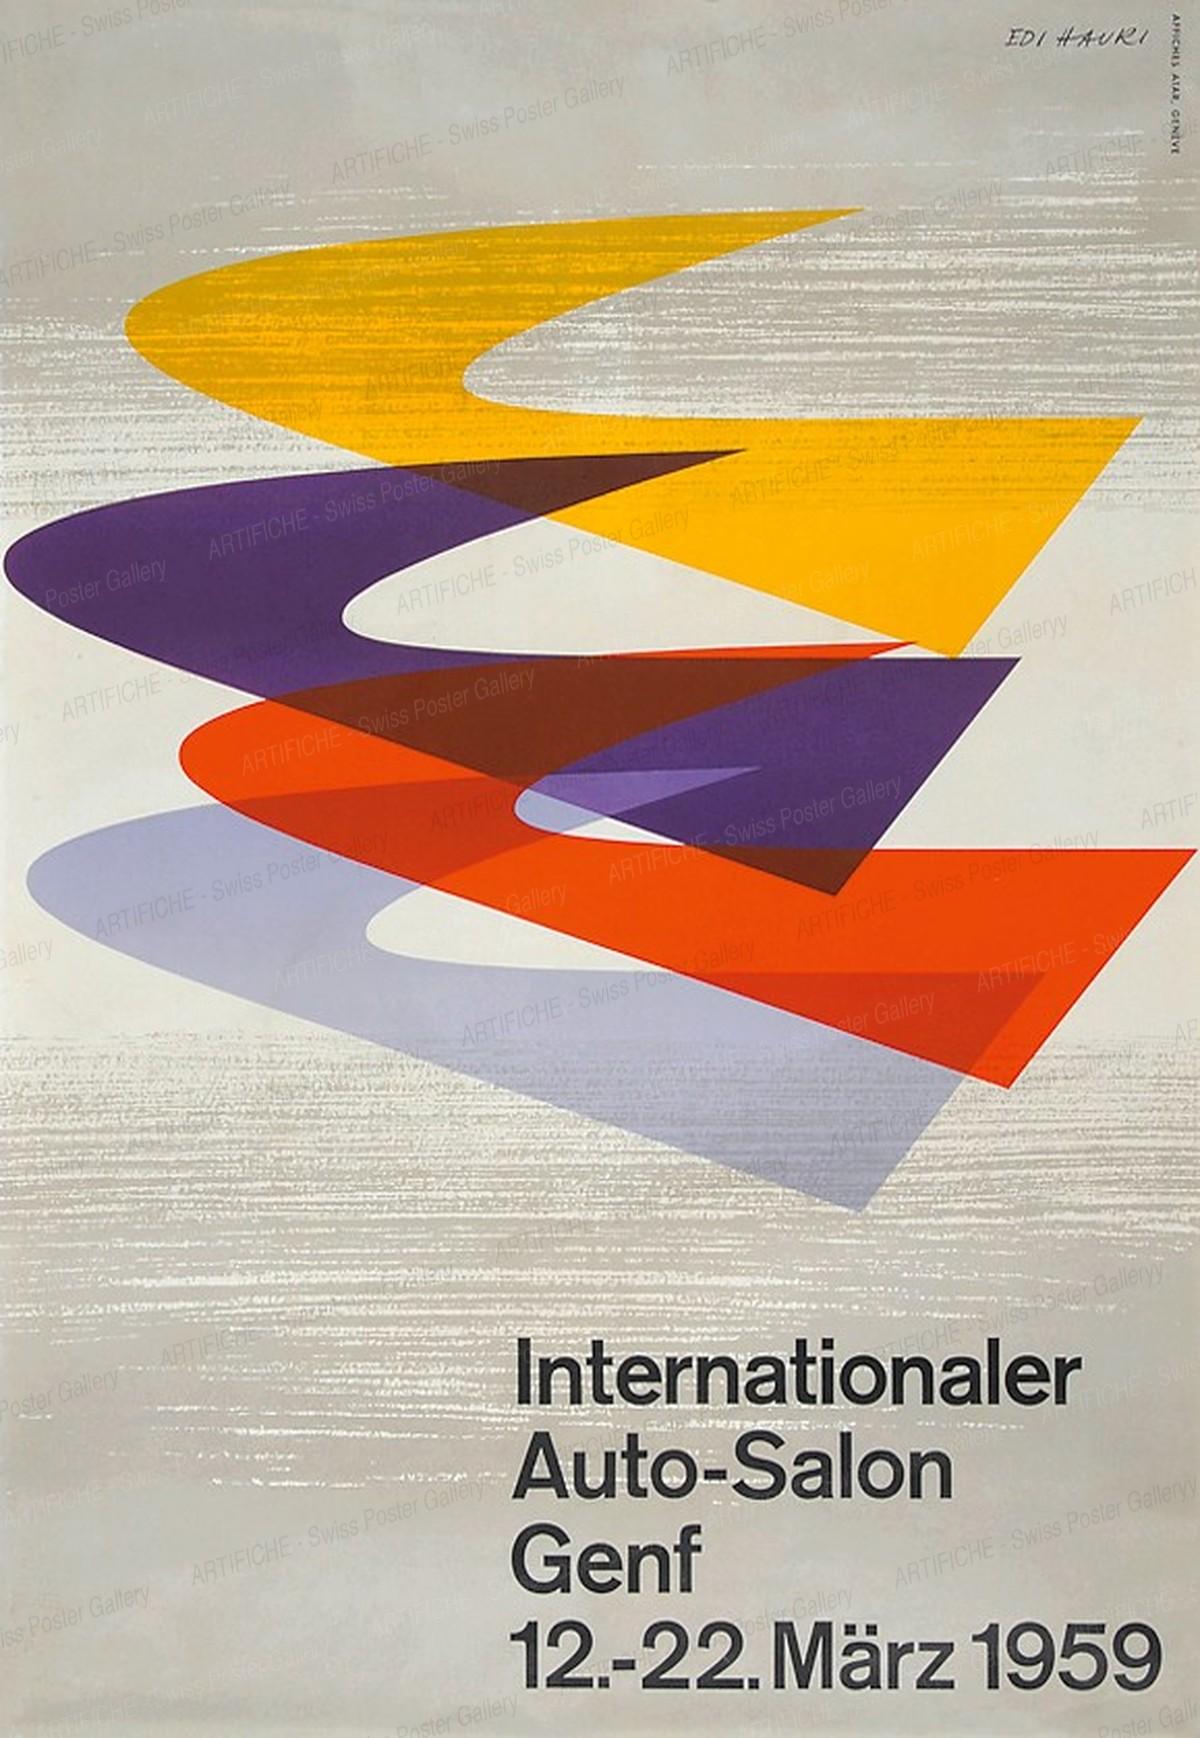 Internationaler Auto-Salon Genf 1959, Edi Hauri